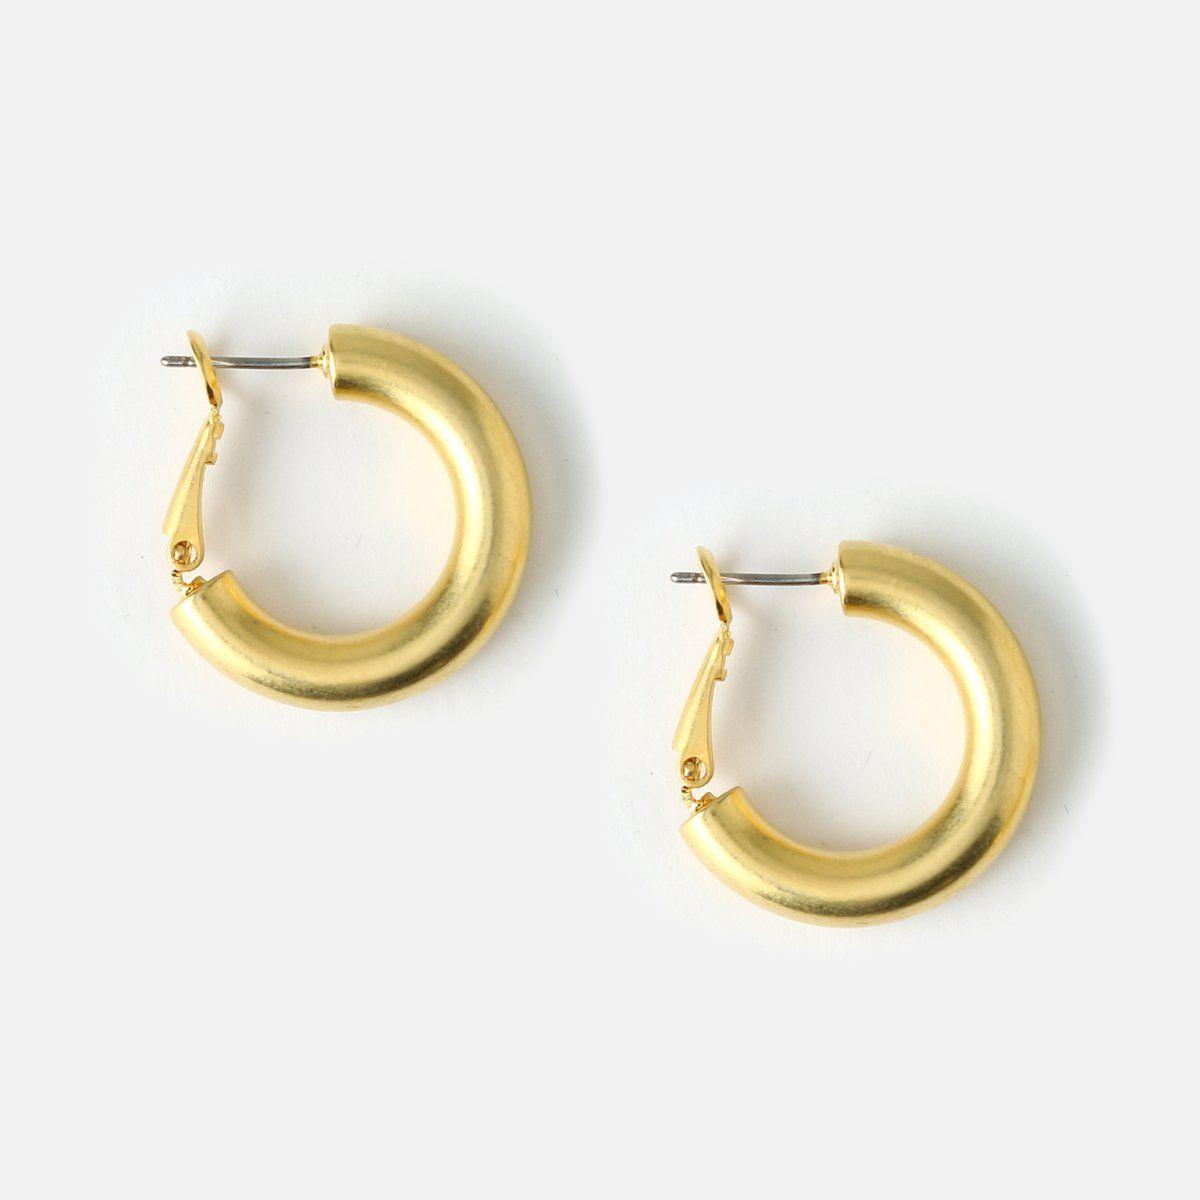 Super Chunky Medium Hoop Earrings Orelia London In 2020 Hoop Earrings Big Hoop Earrings Hoops Earrings Outfit